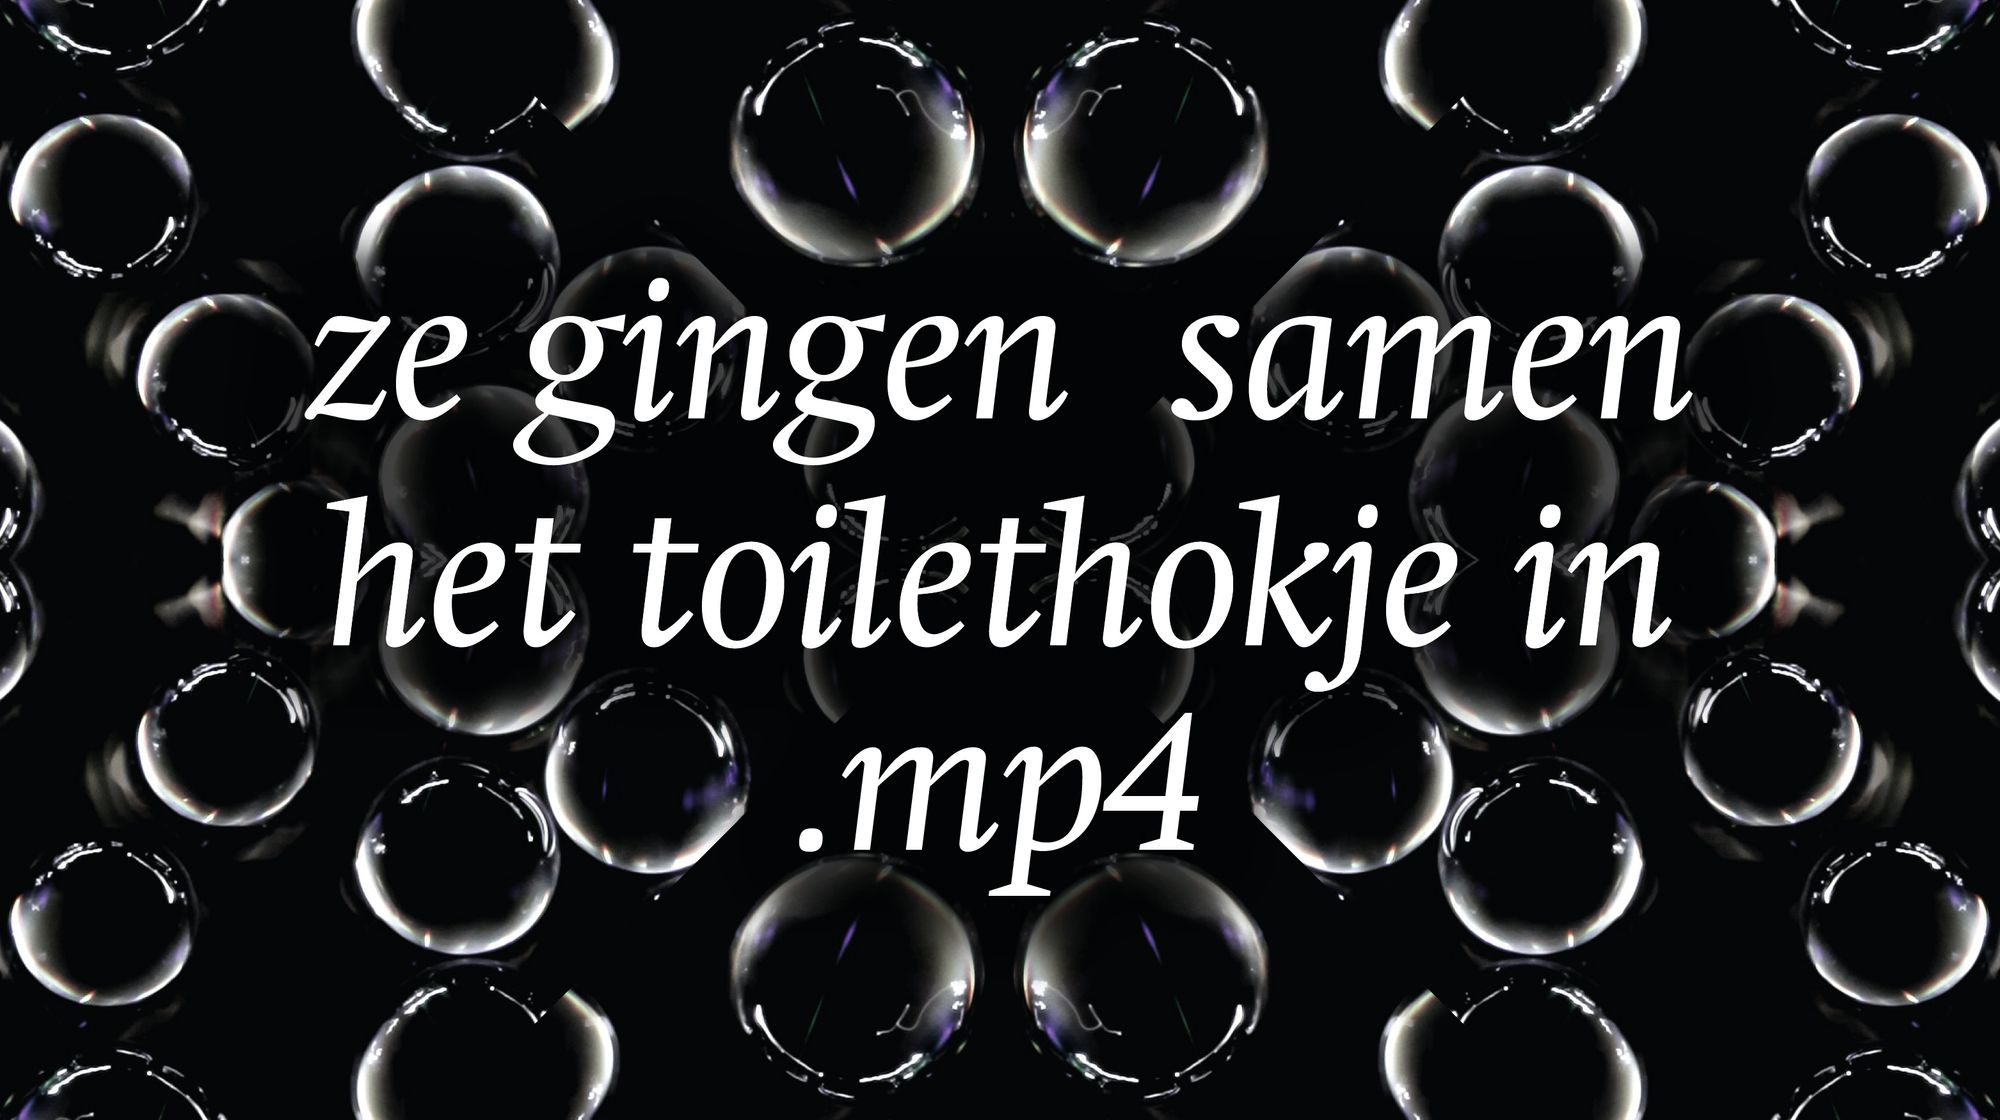 Ze gingen samen het toilethokje in.mp4